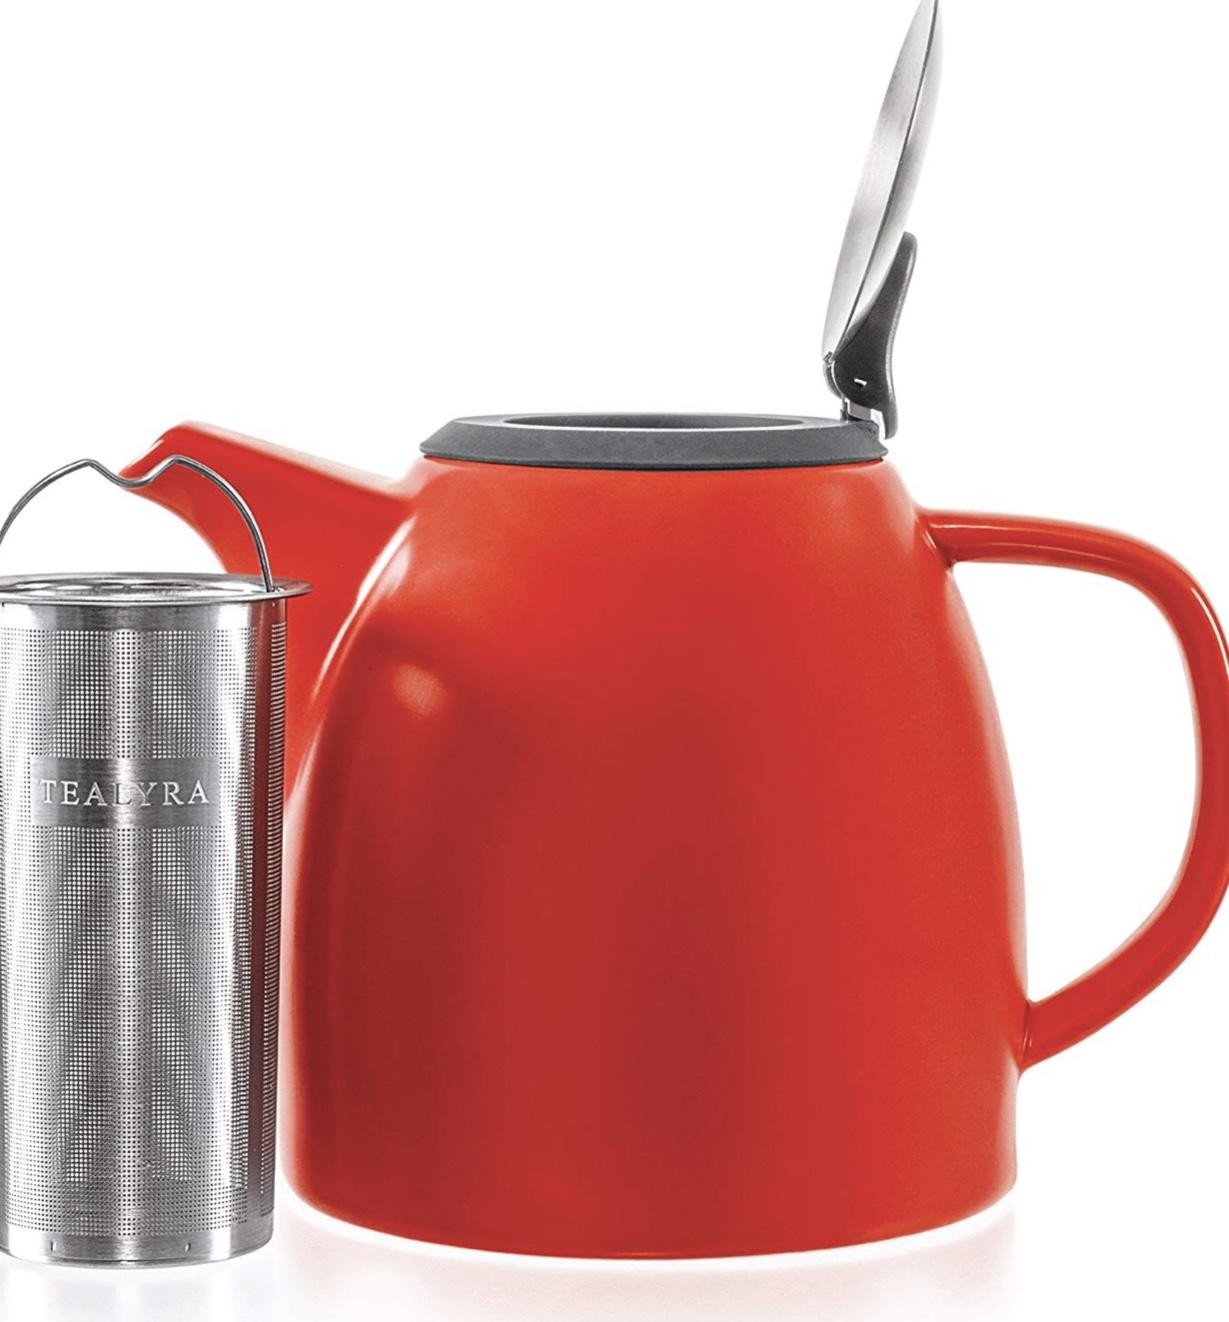 Tealyra Drago Teapot- Red